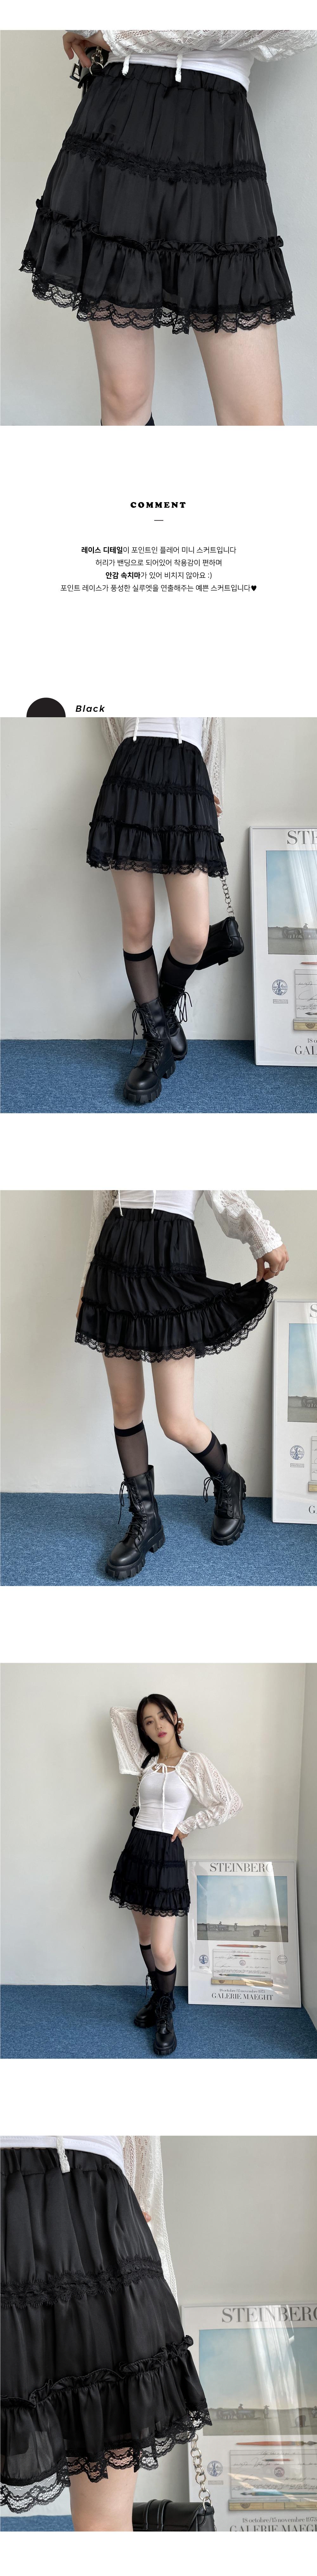 Mune Lace Flare Banding Mini Skirt